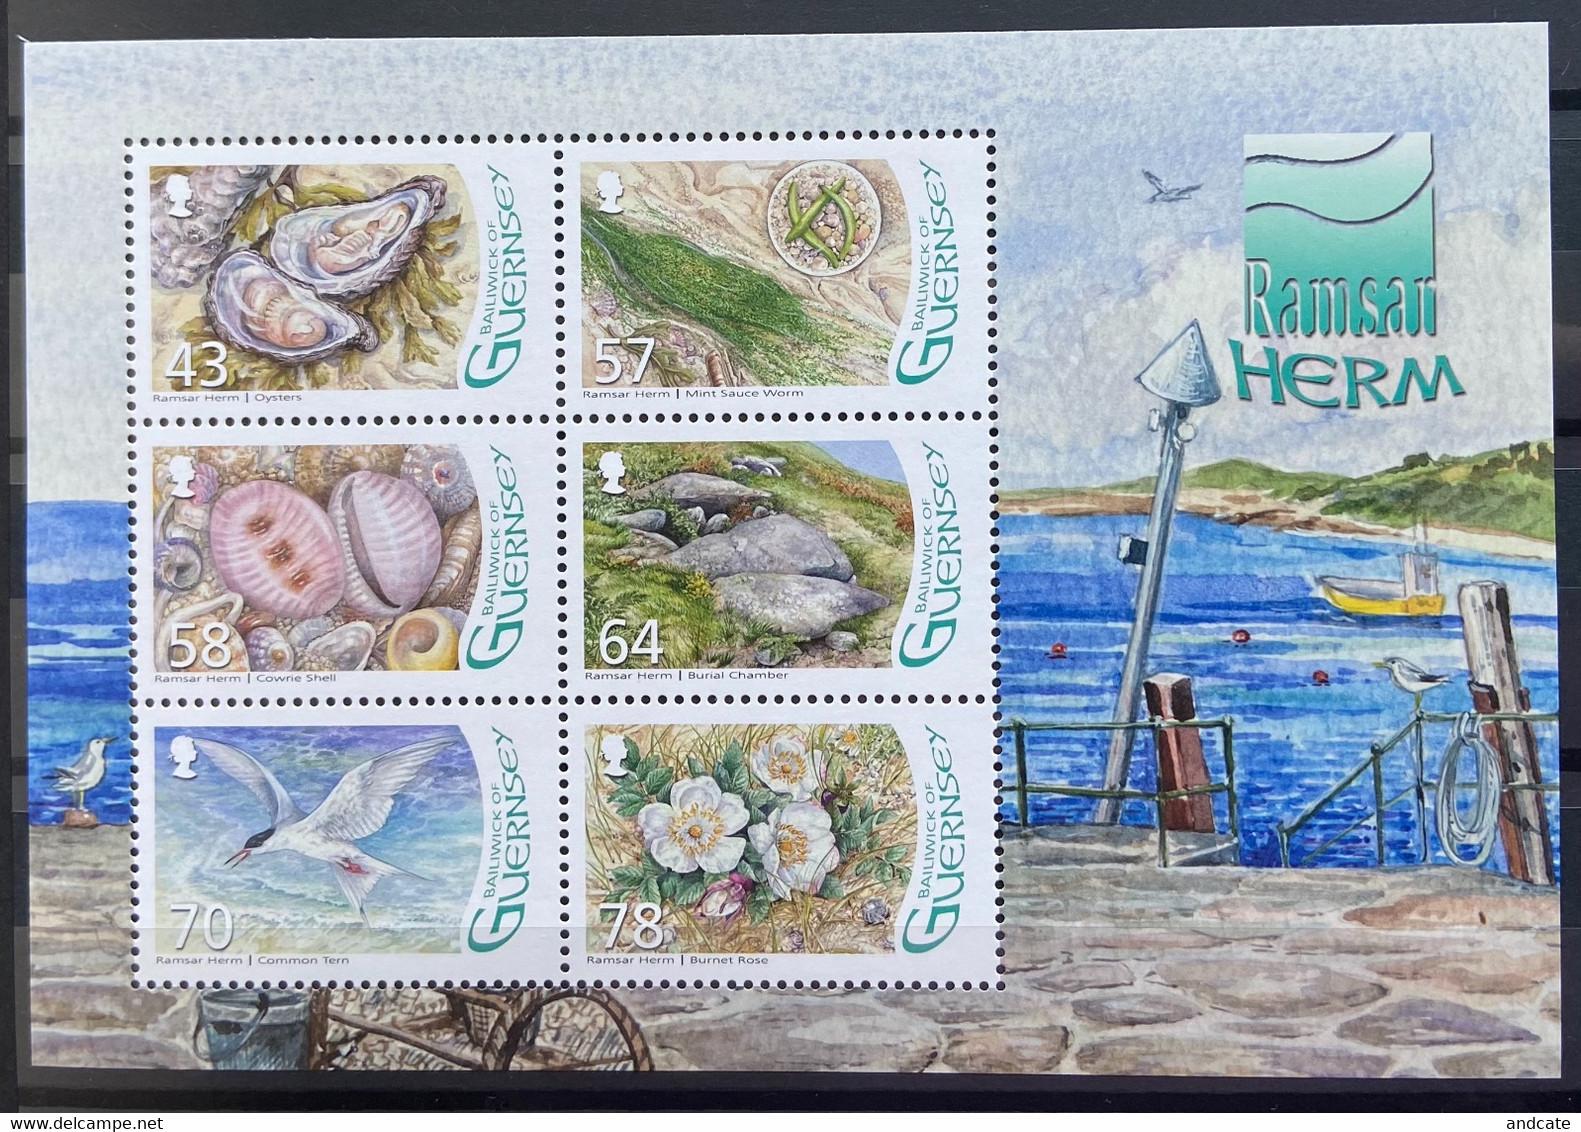 Guernsey 2016 MNH - Ramsar Herm - Guernsey